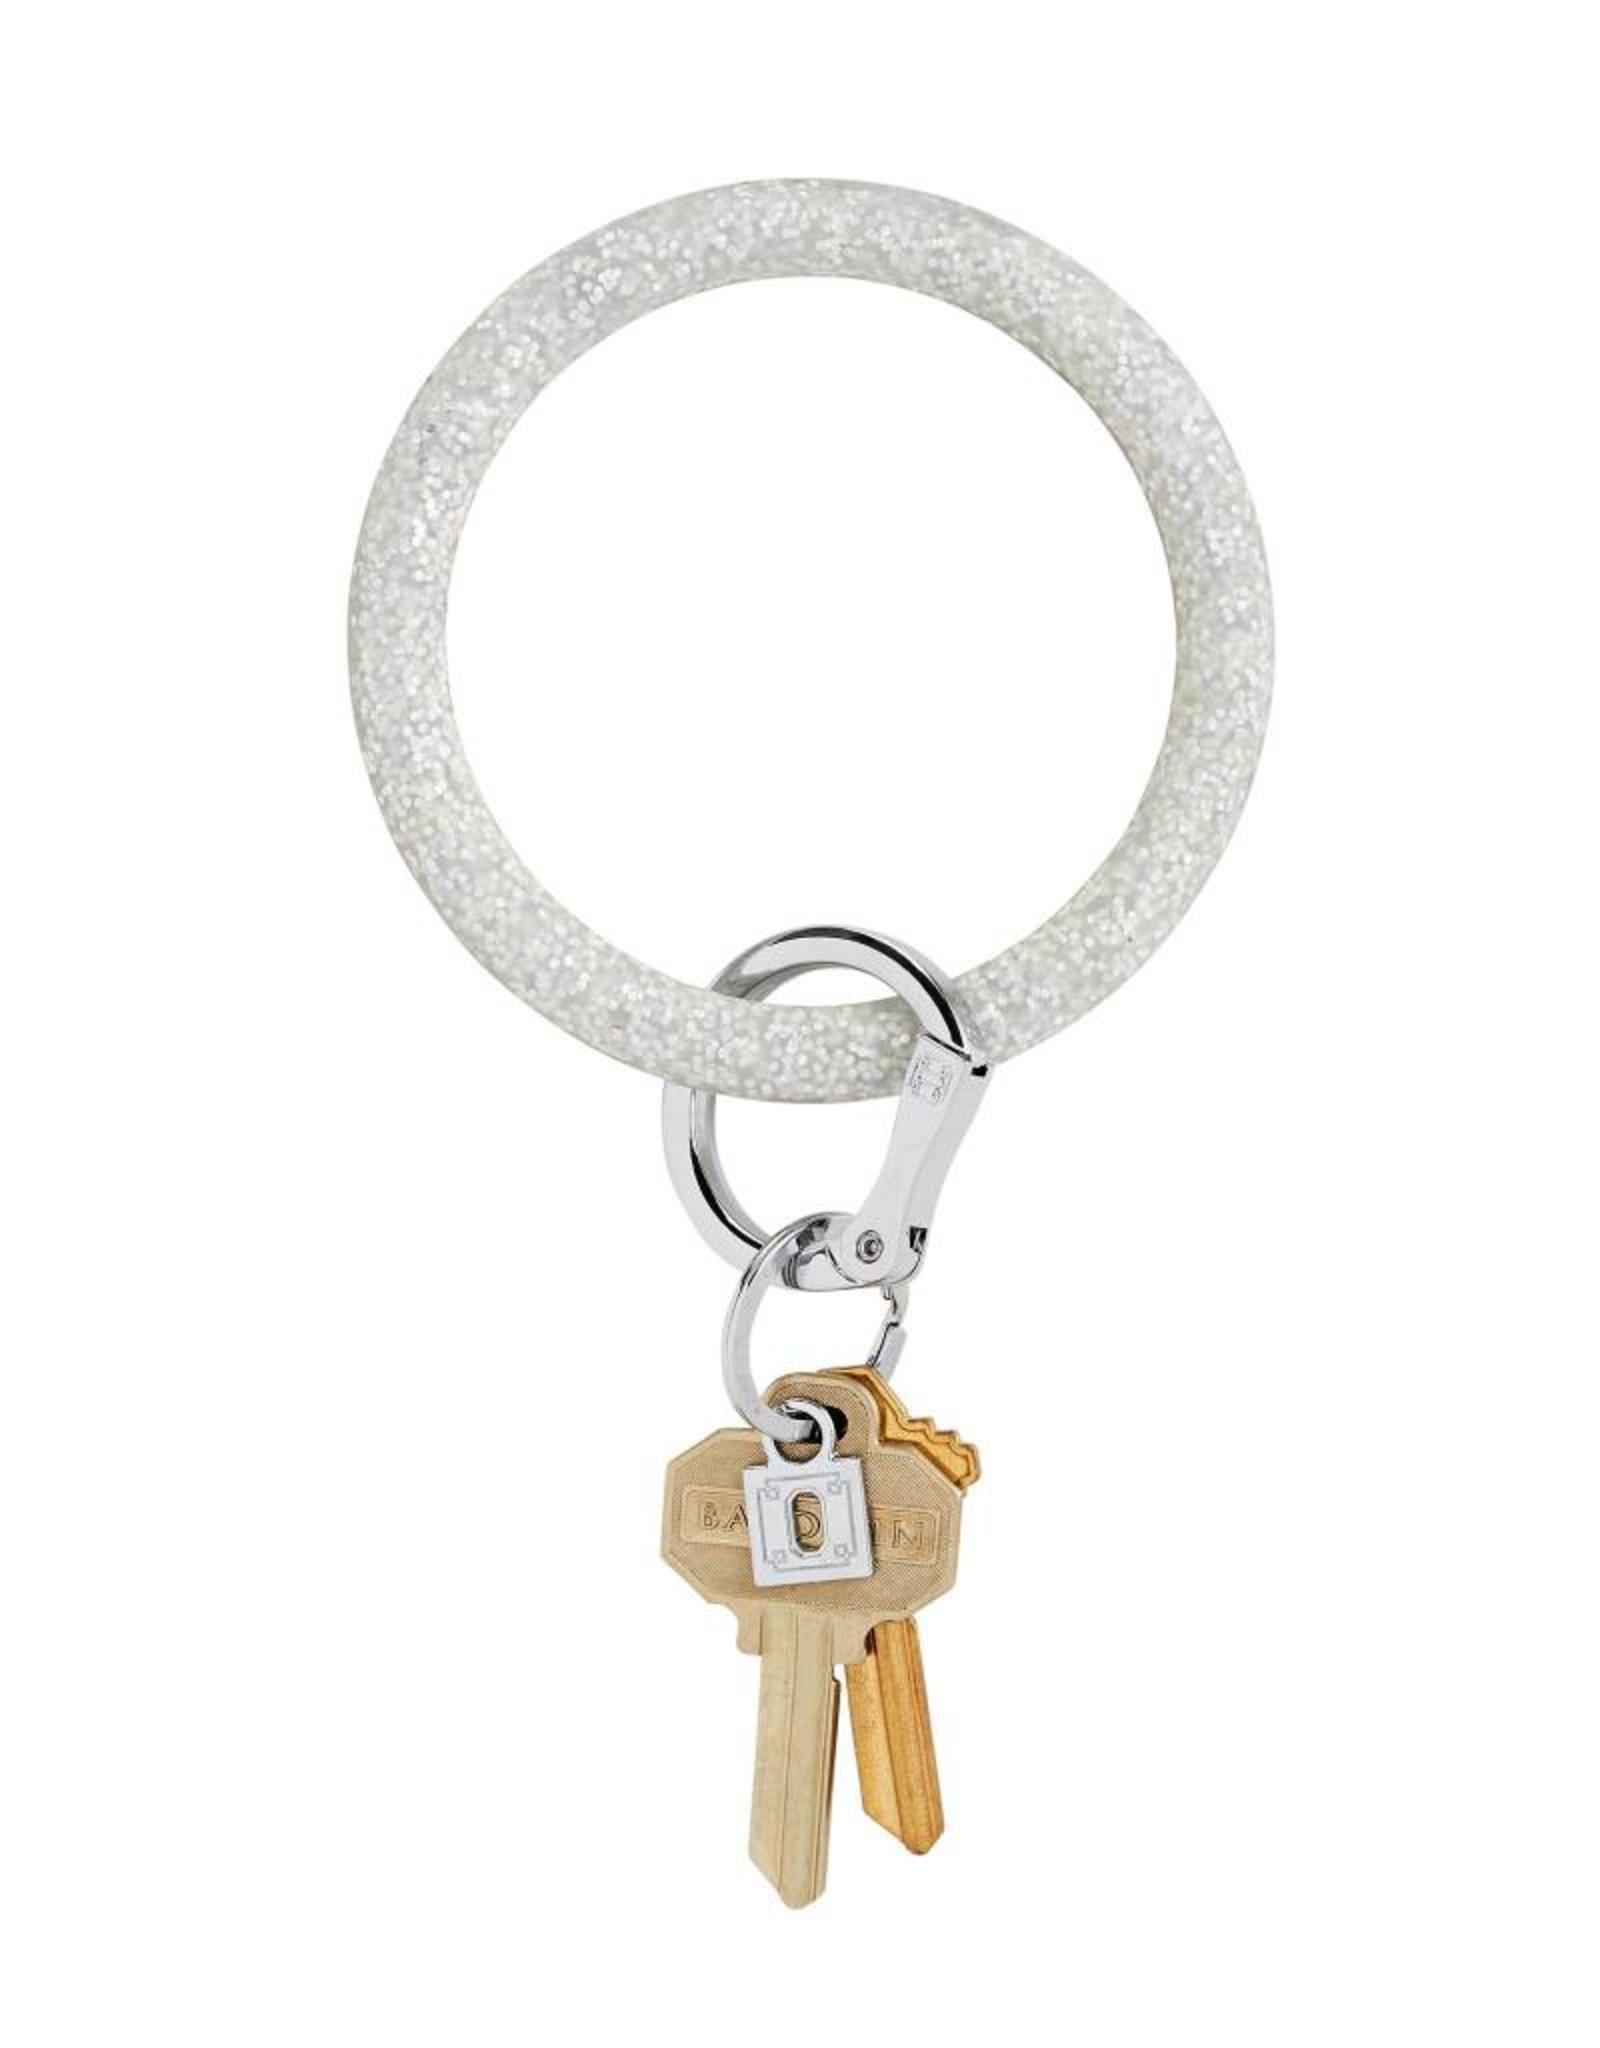 Big O Key Ring silver confetti silicone